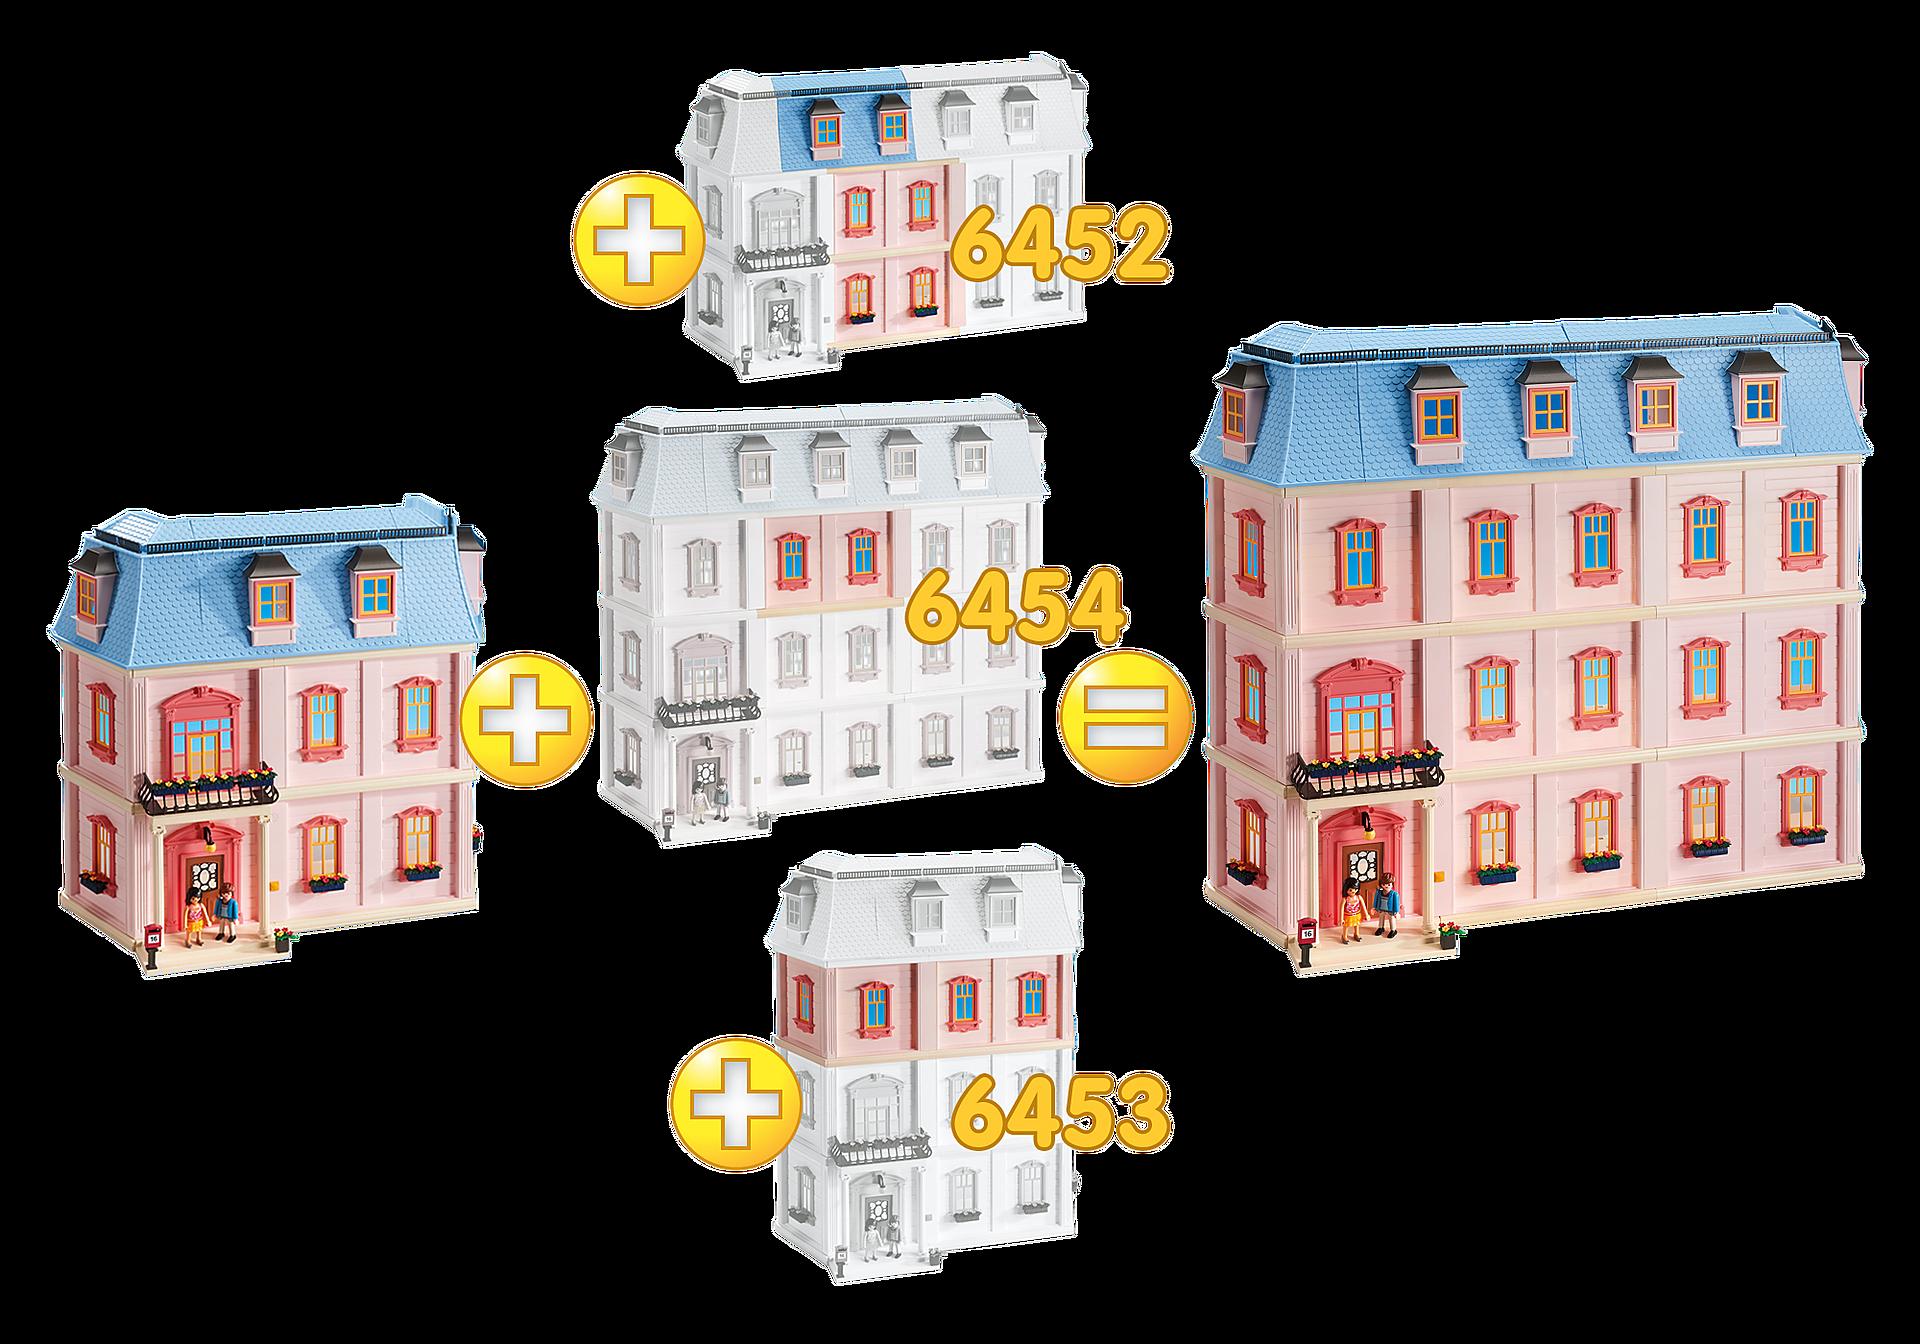 http://media.playmobil.com/i/playmobil/6454_product_extra1/Puppenhaus Erweiterung C